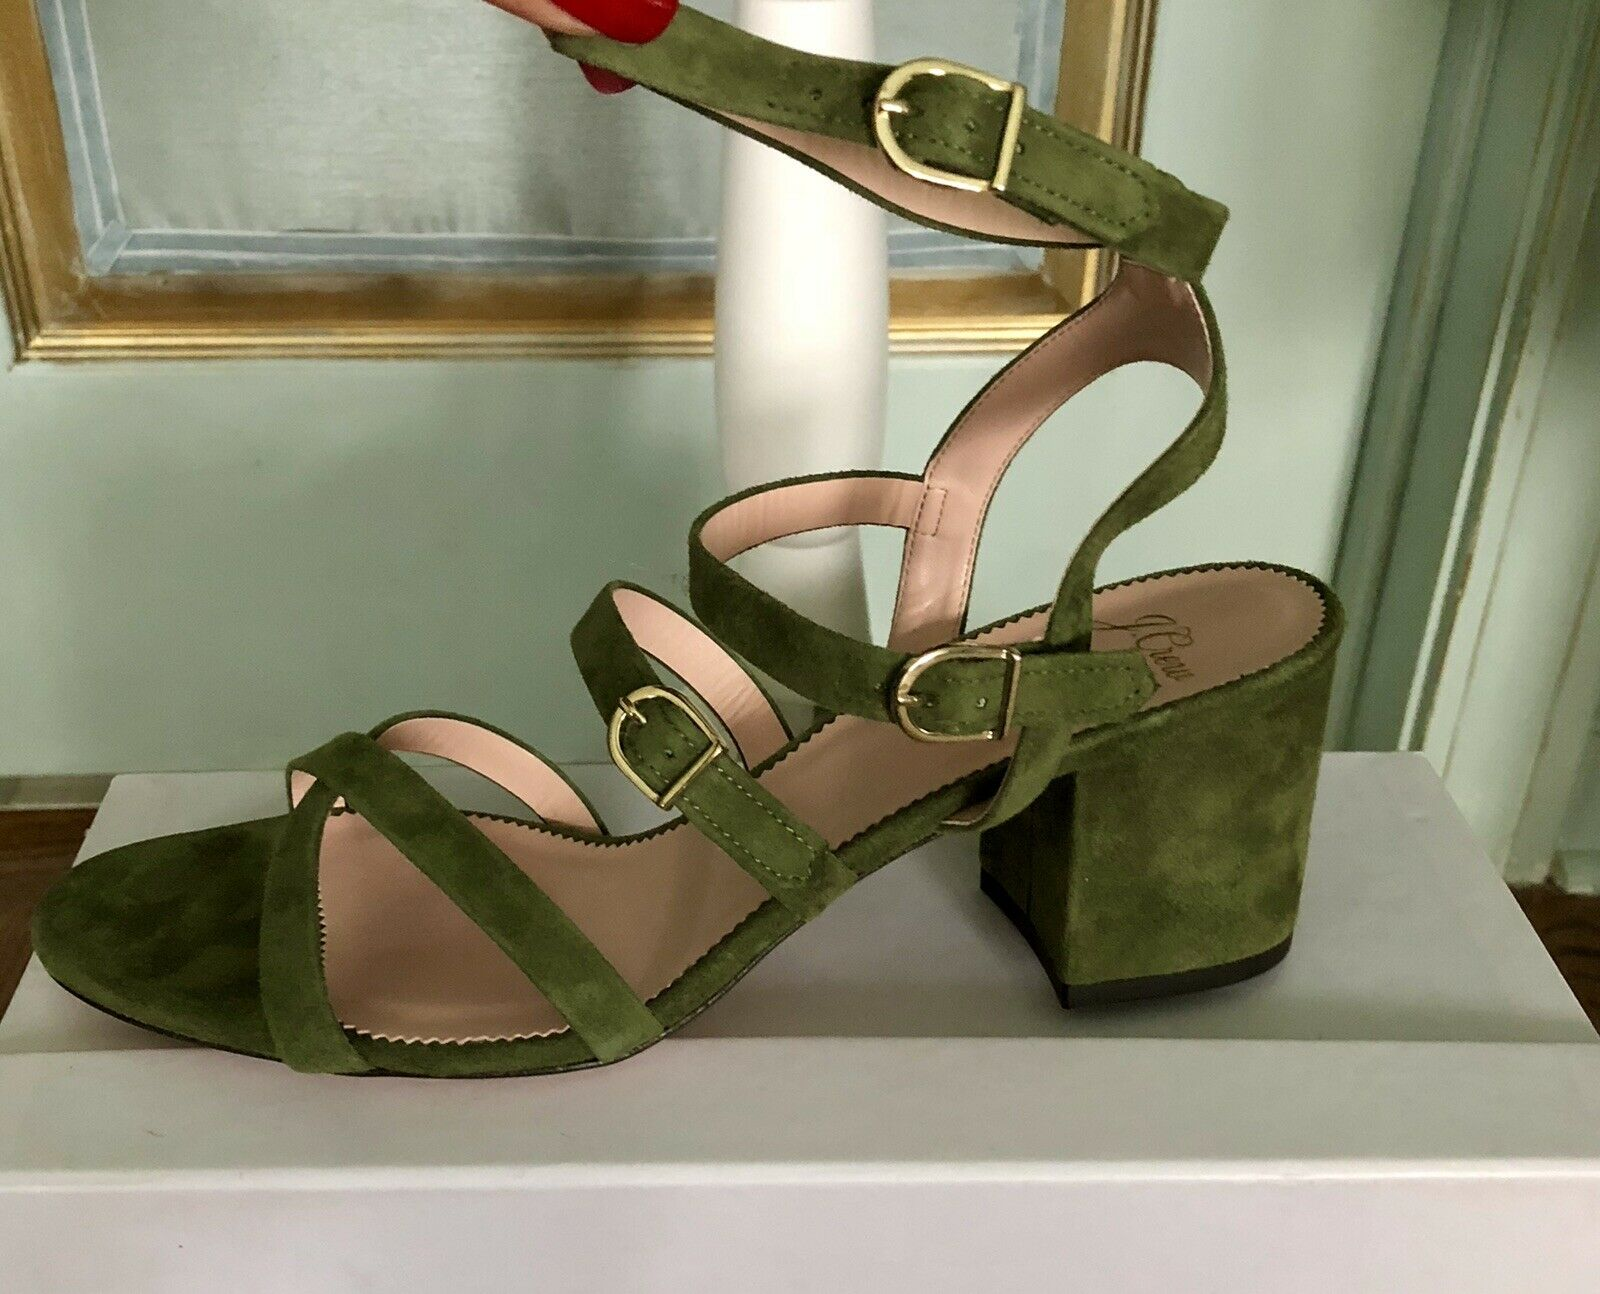 NWB J.Crew verde Suede Sandals  Dimensione 9,5 Made in   confortevole